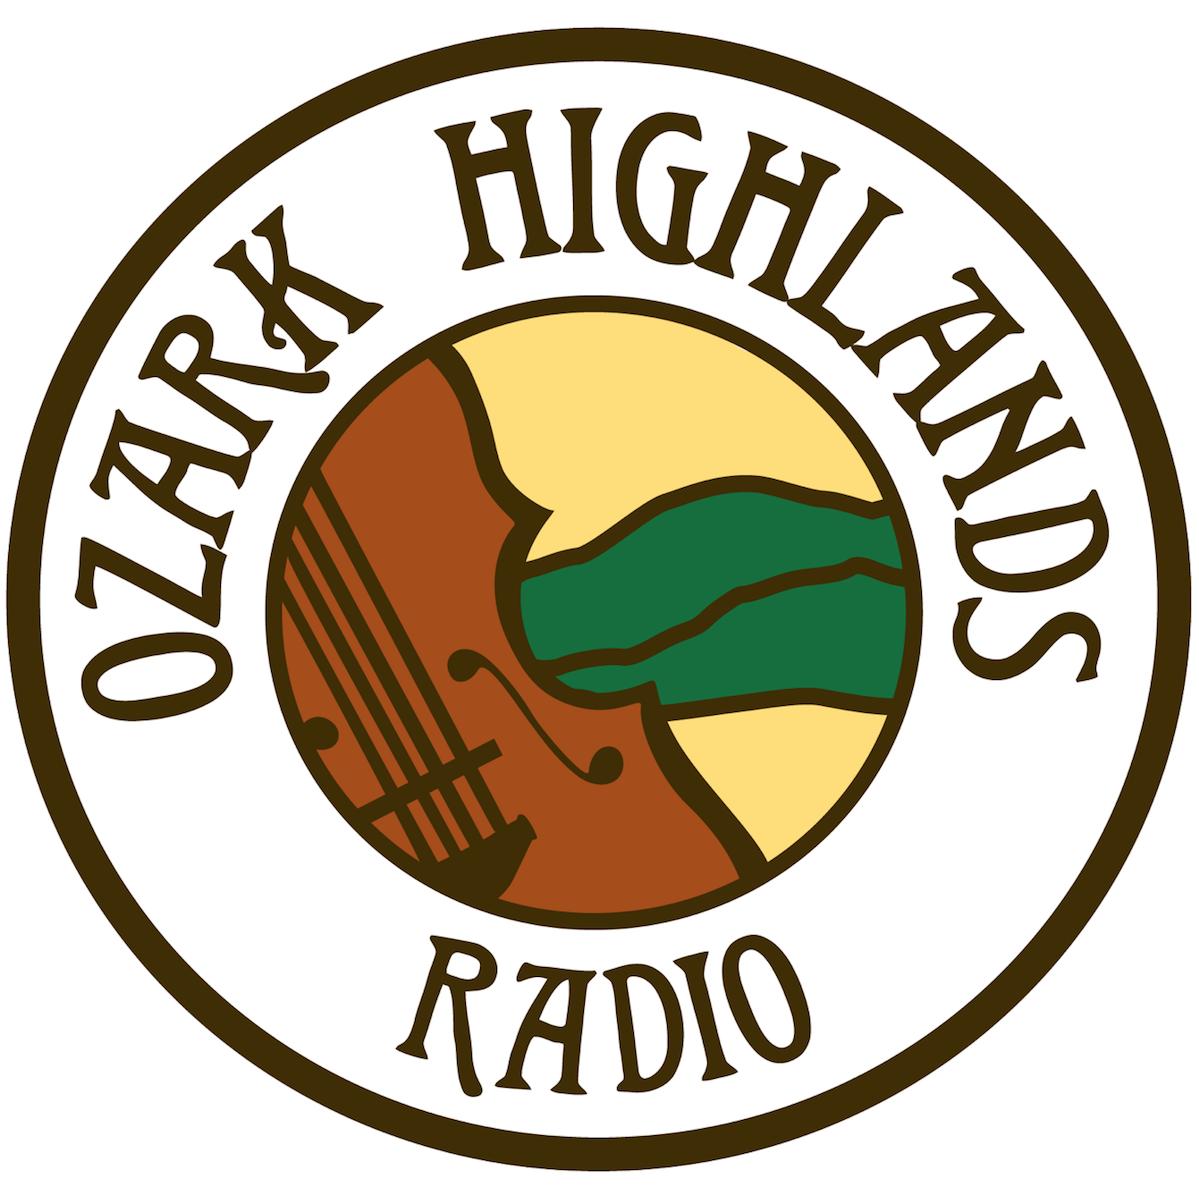 Caption: Ozark Folk Center State Park